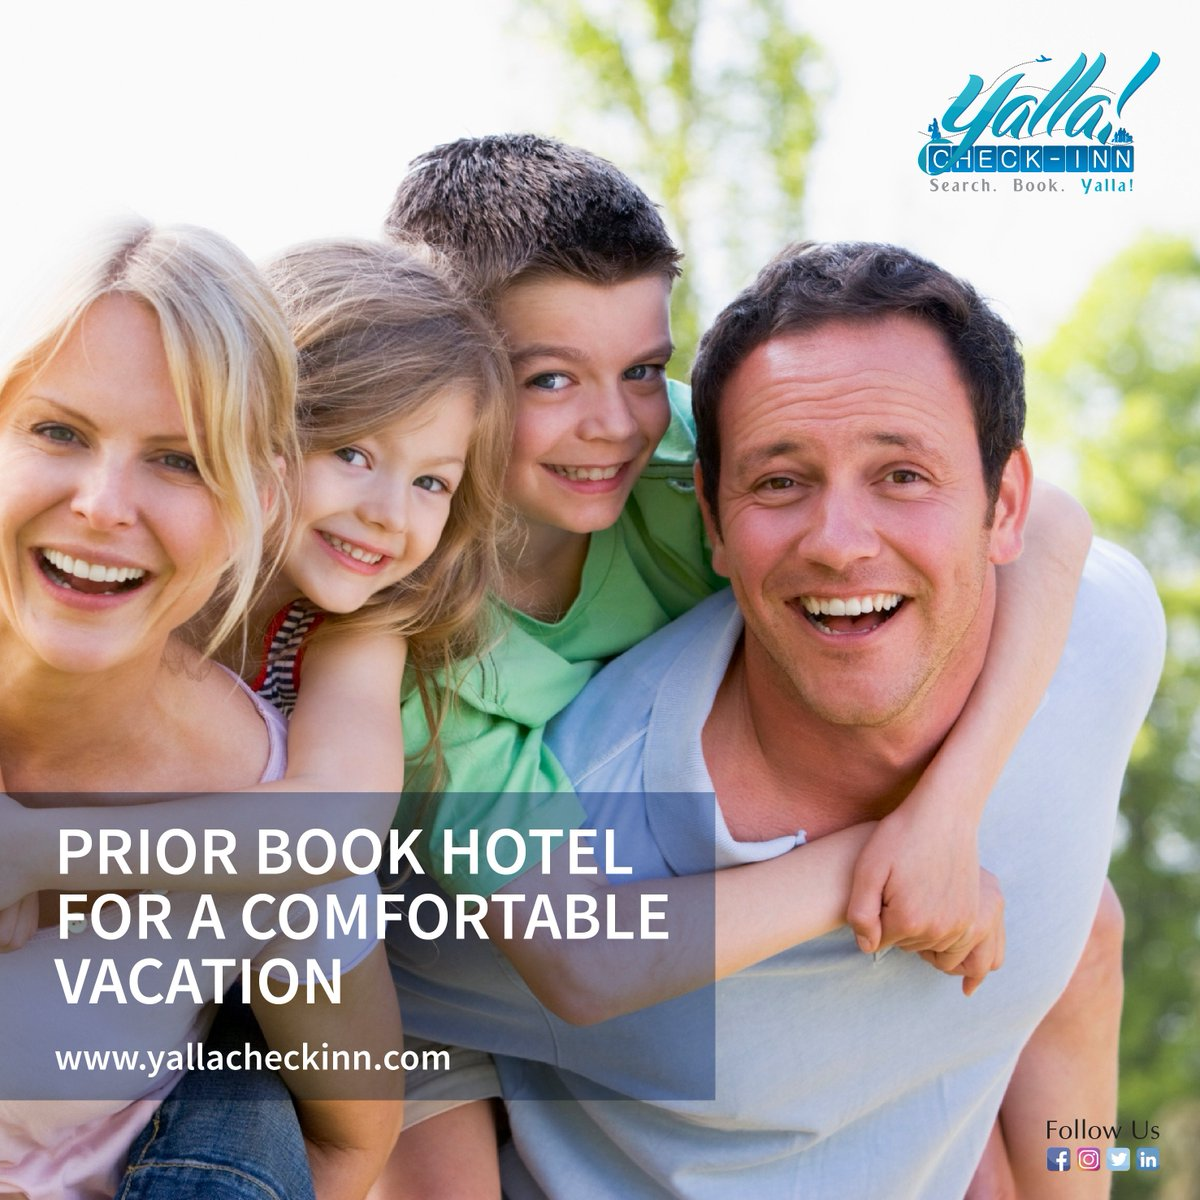 🏨🛎️🇶🇦 #Book #HOTELS before your journey https://t.co/baScaL4E94 https://t.co/QTxtfZj3K0